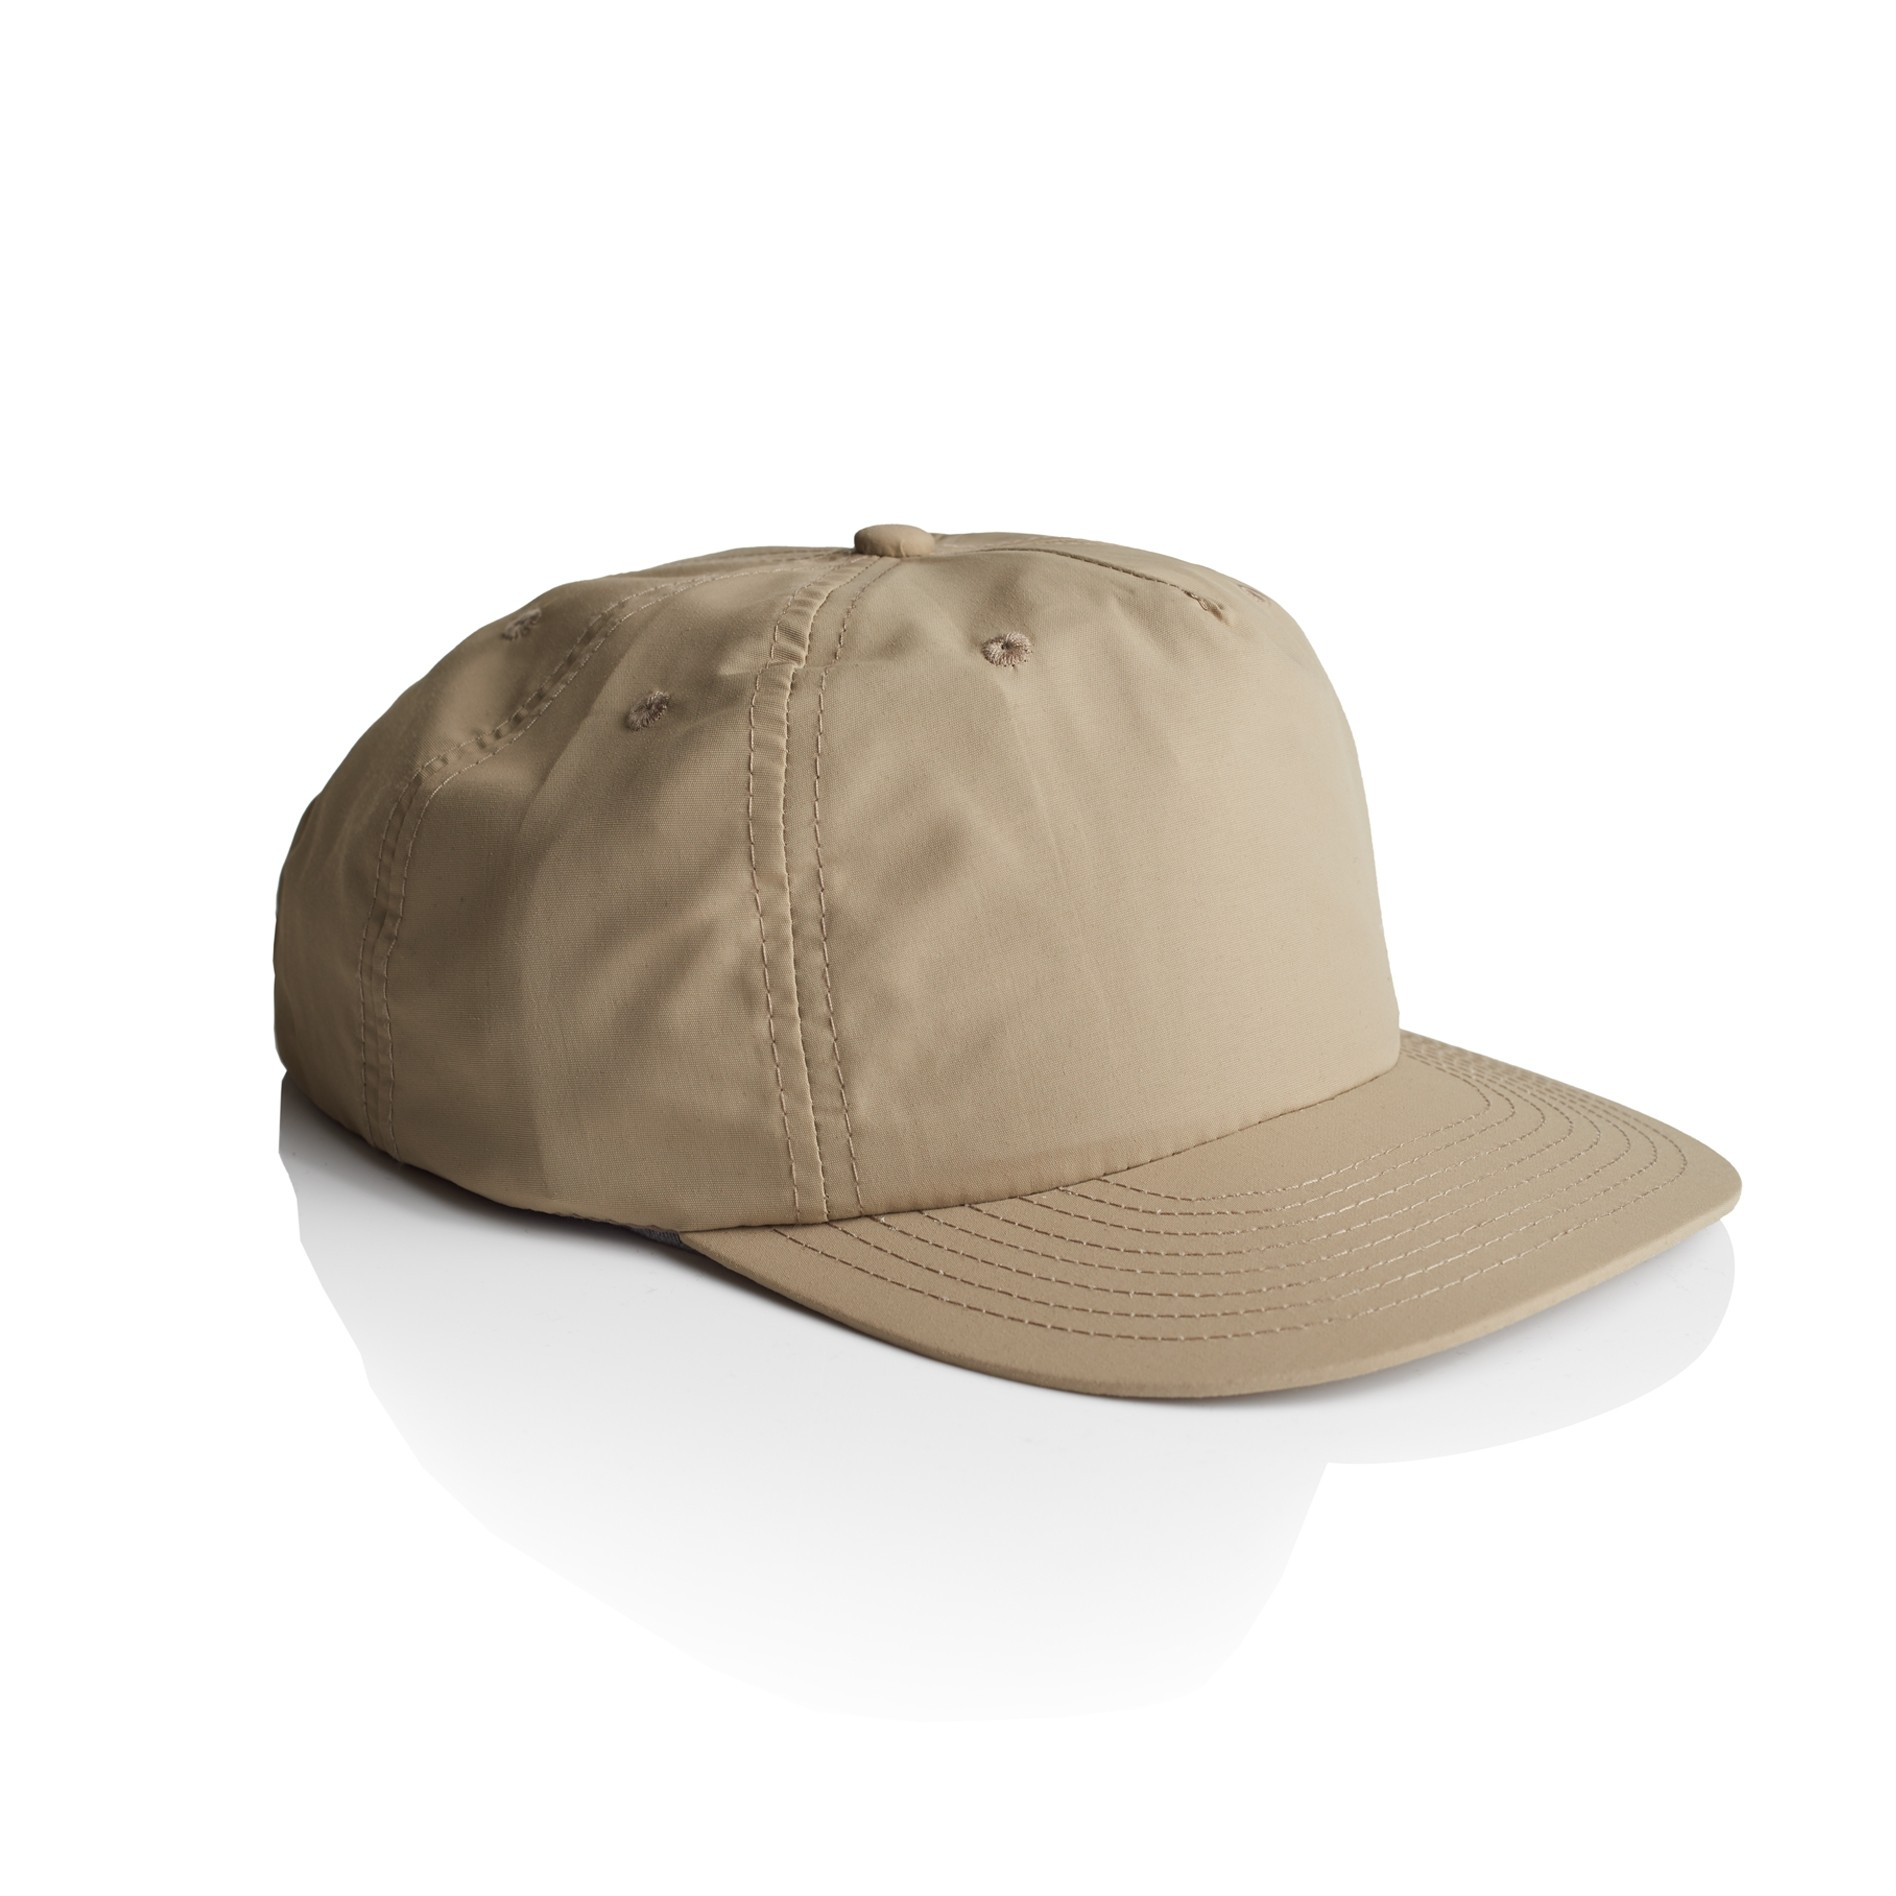 d437ed45da0 AS Surf Cap - Khaki - Nublank Caps